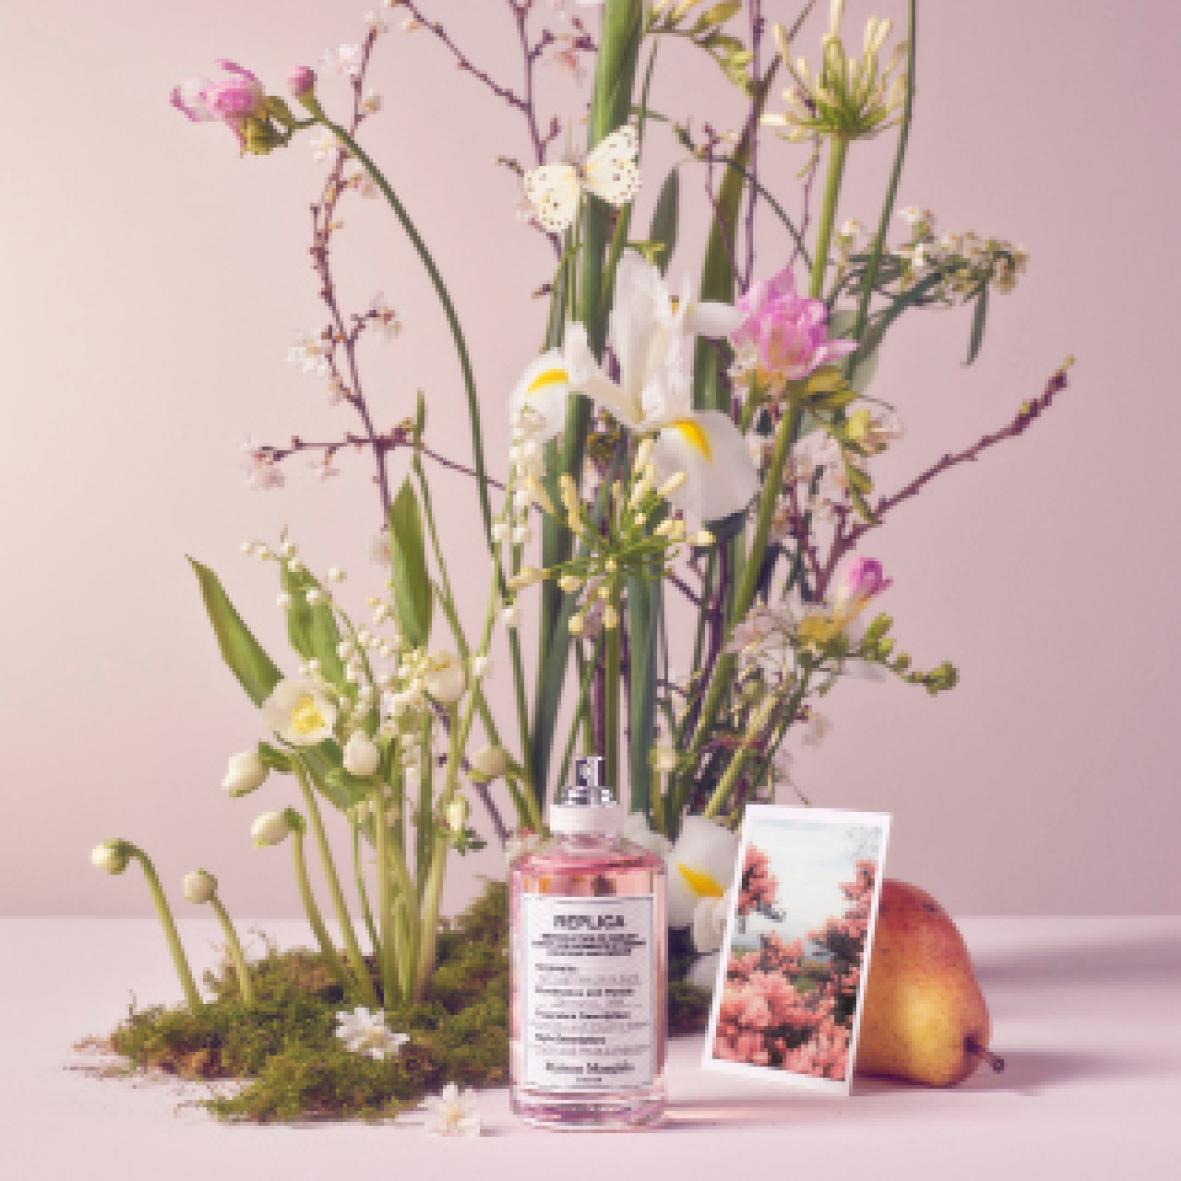 REPLICA Springtime in a Park product media